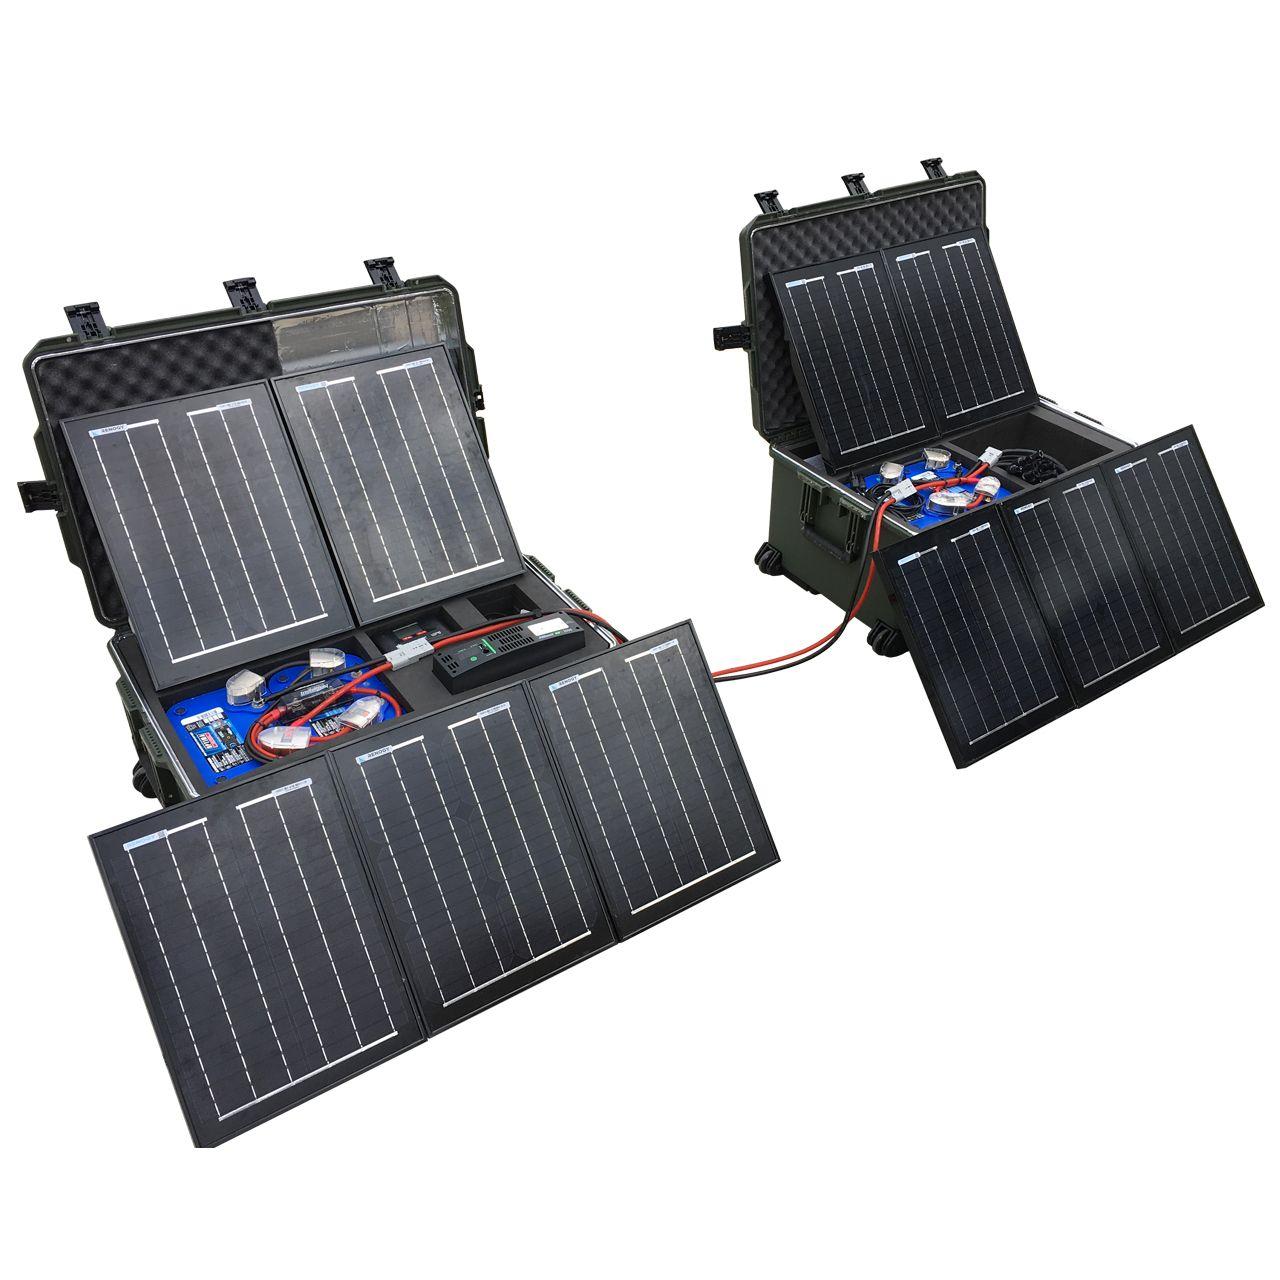 Ultimate Tactical Solar Power Generator Kit Always Empowered Solar Technology Solar Energy Solar Heating